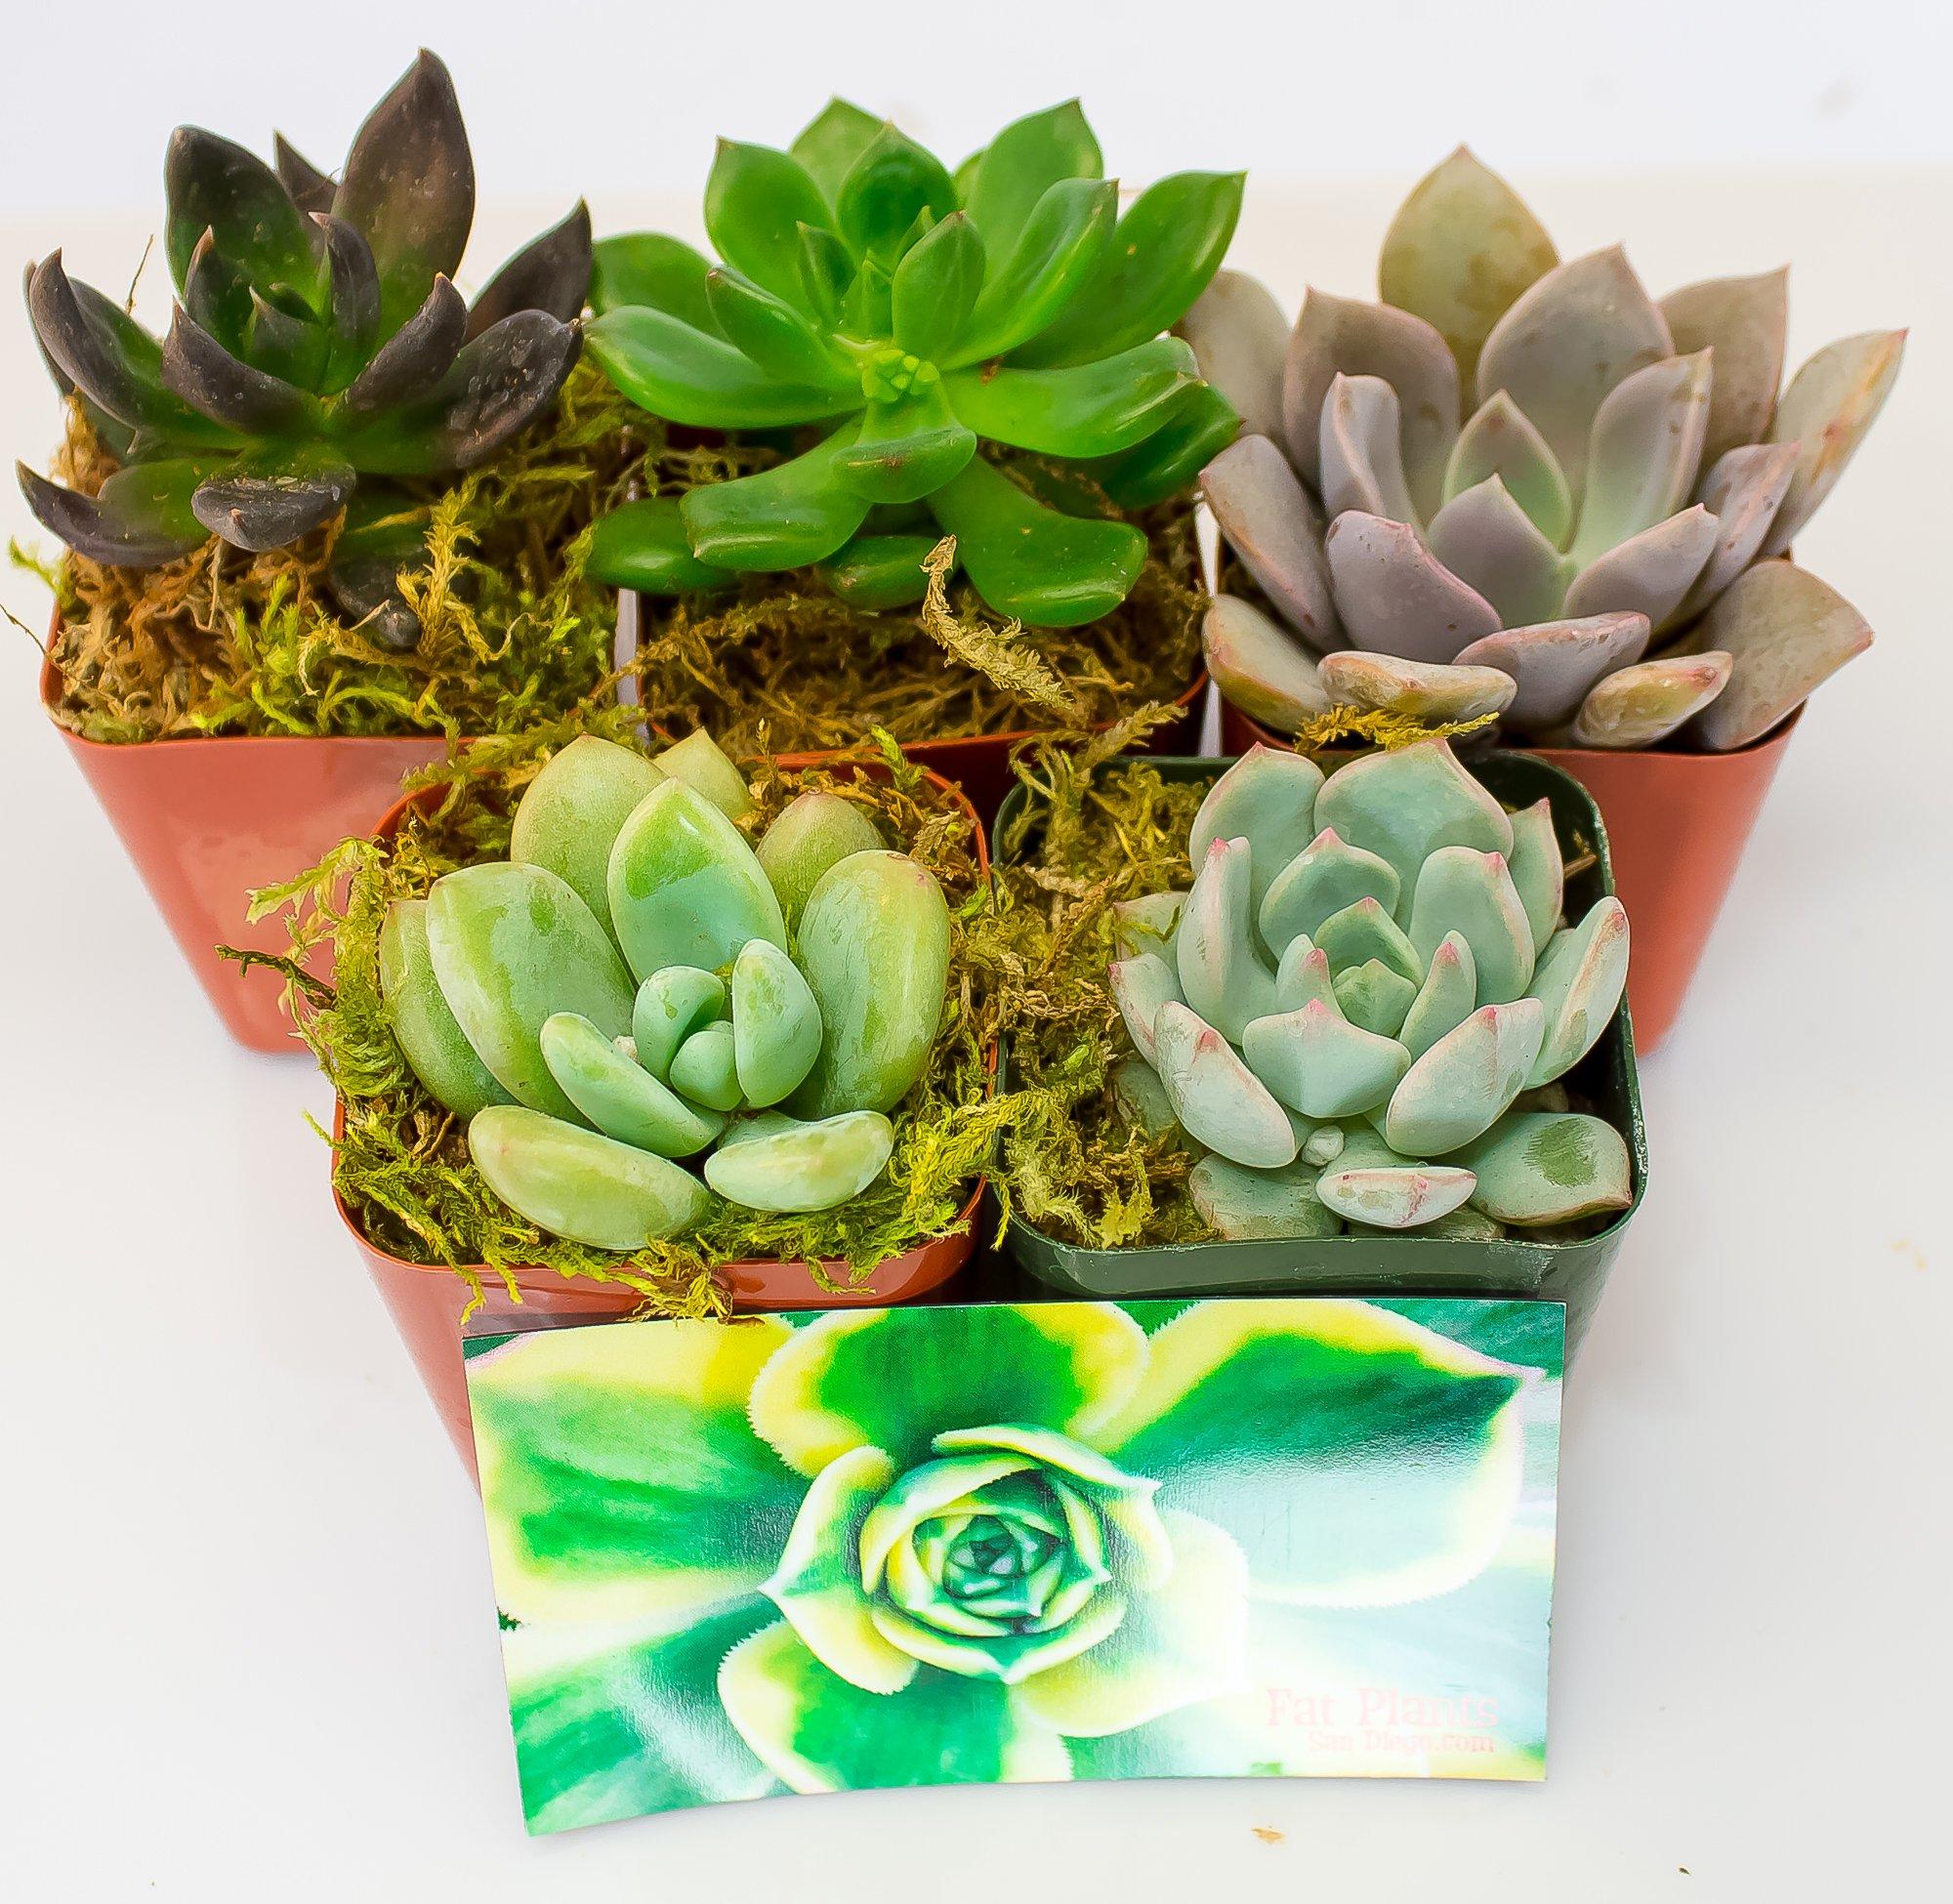 Fat Plants San Diego All Rosette Succulent Plants in 2 Inch Pots (5)